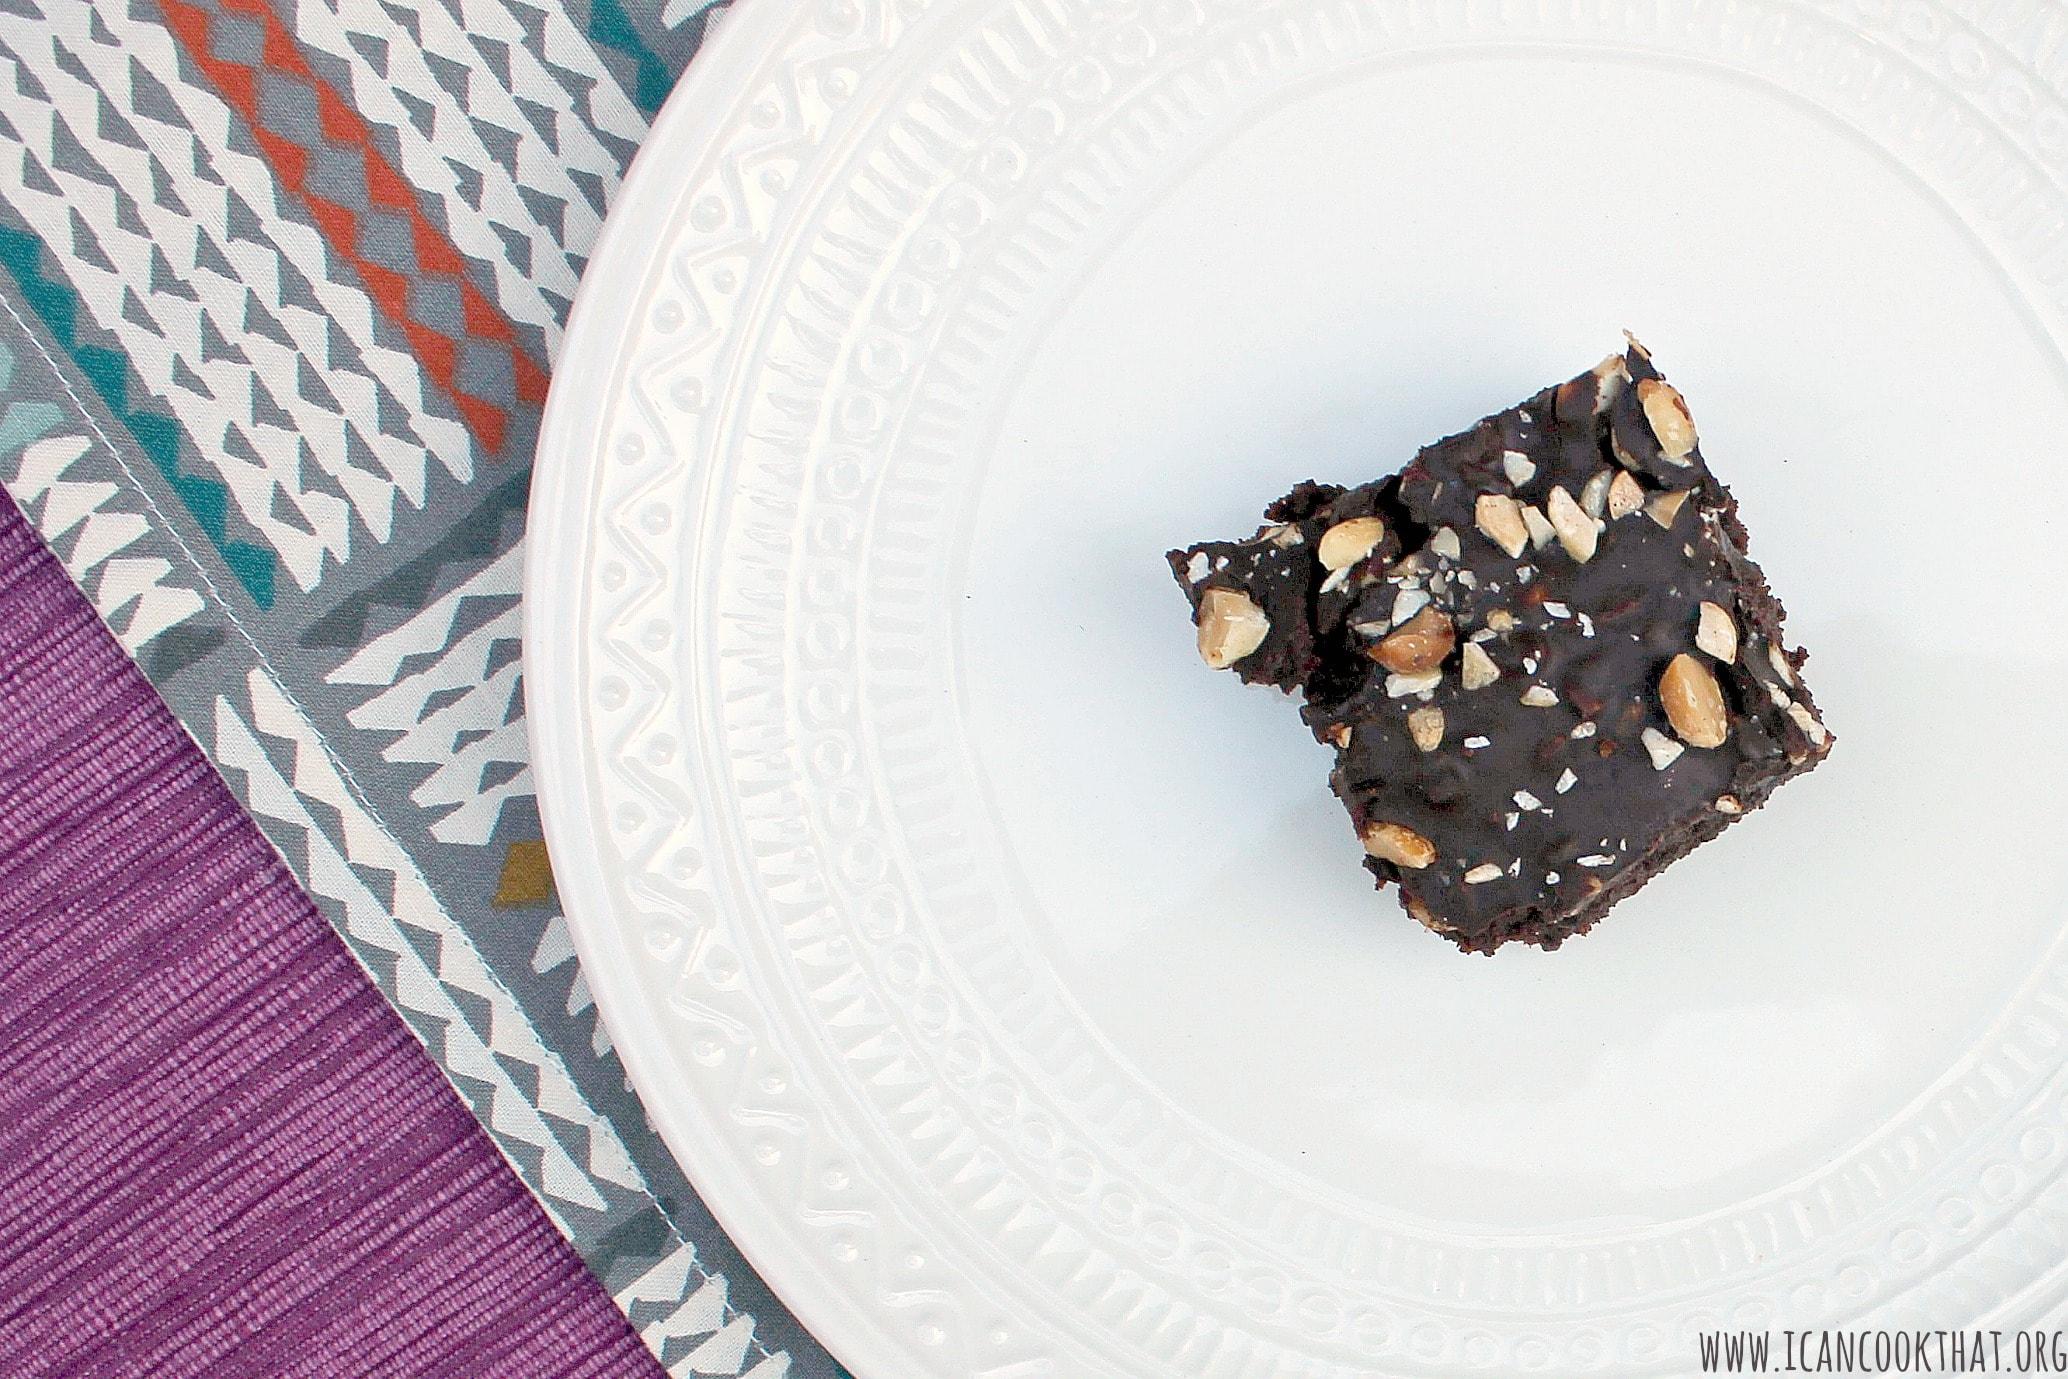 Vegan and Gluten Free Peanut Crunch Brownies